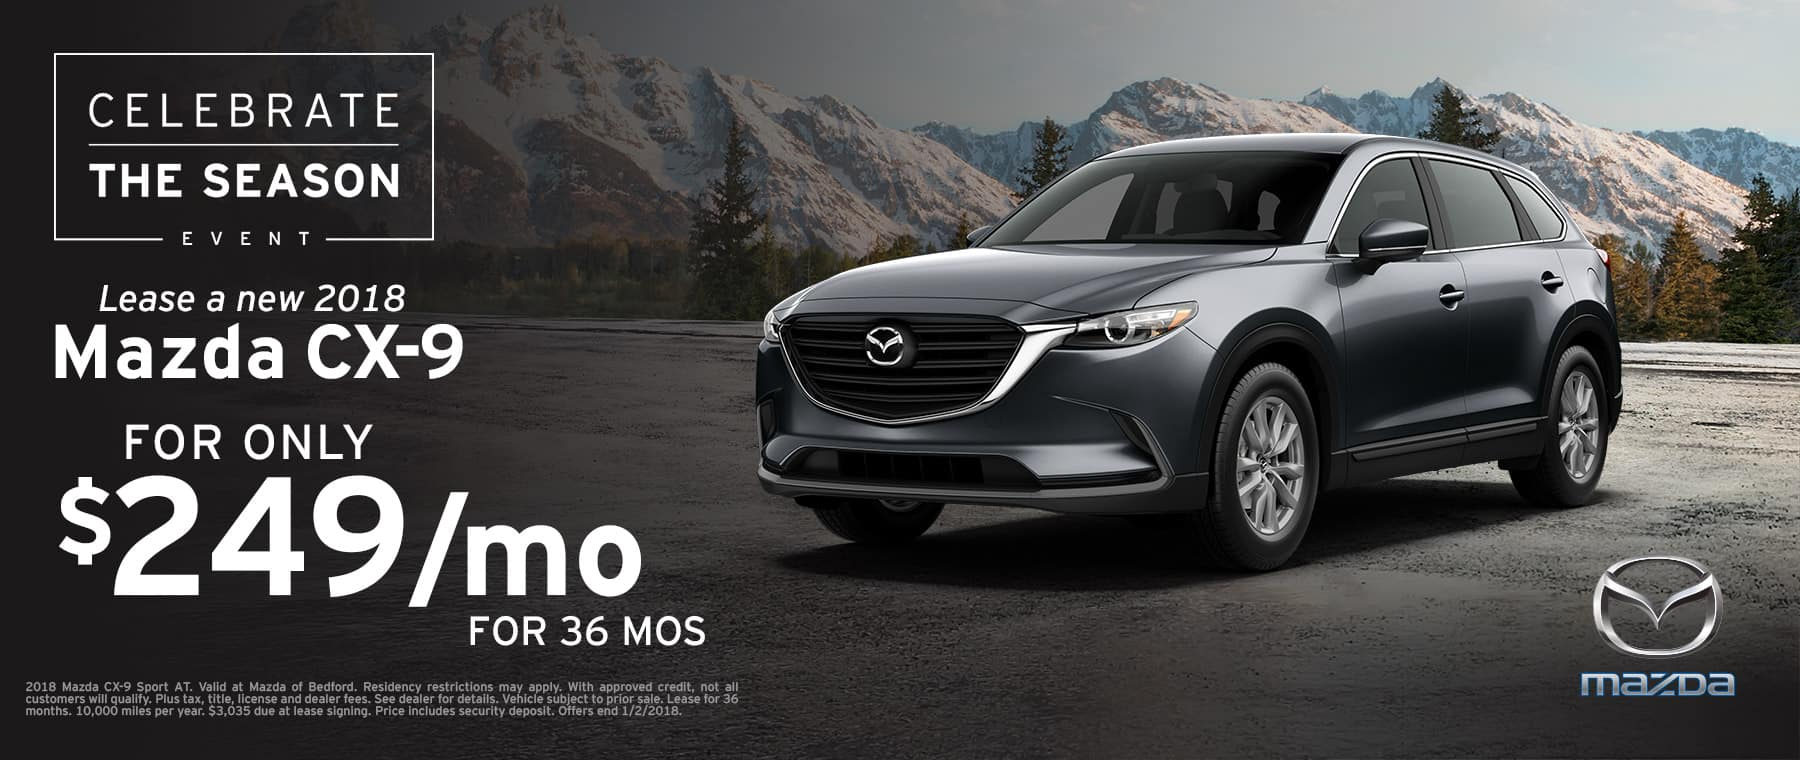 2018 Mazda CX-9 Lease Offer